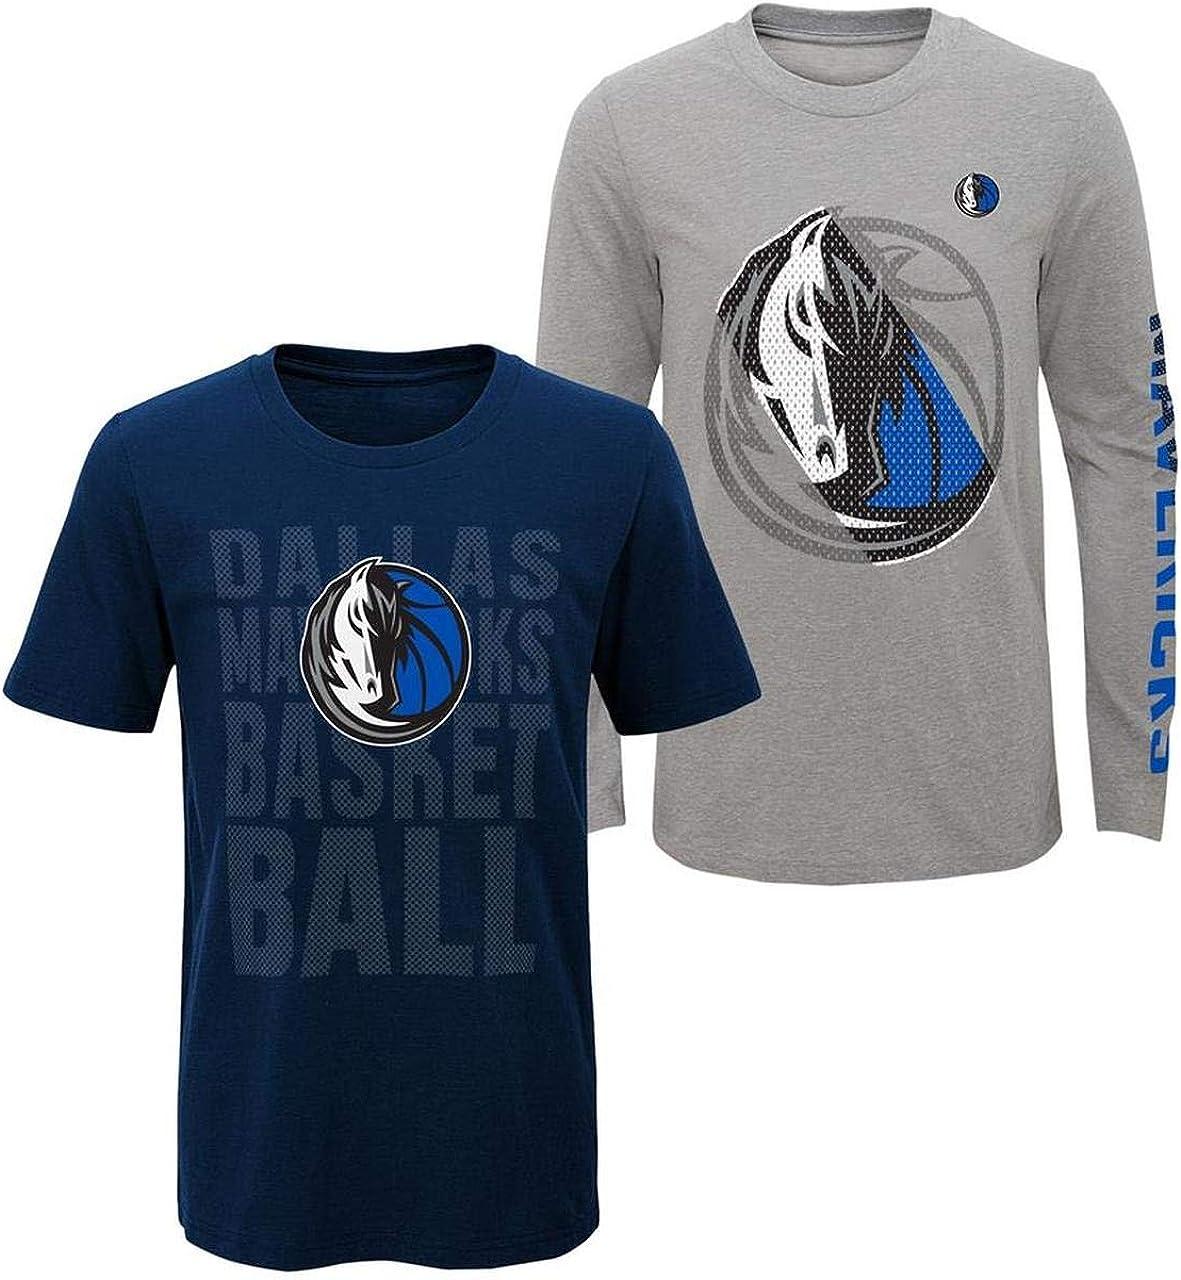 NBA Youth 8-20 Primary Logo 2 for 1 Long Sleeve Short Sleeve T-Shirt Combo Set